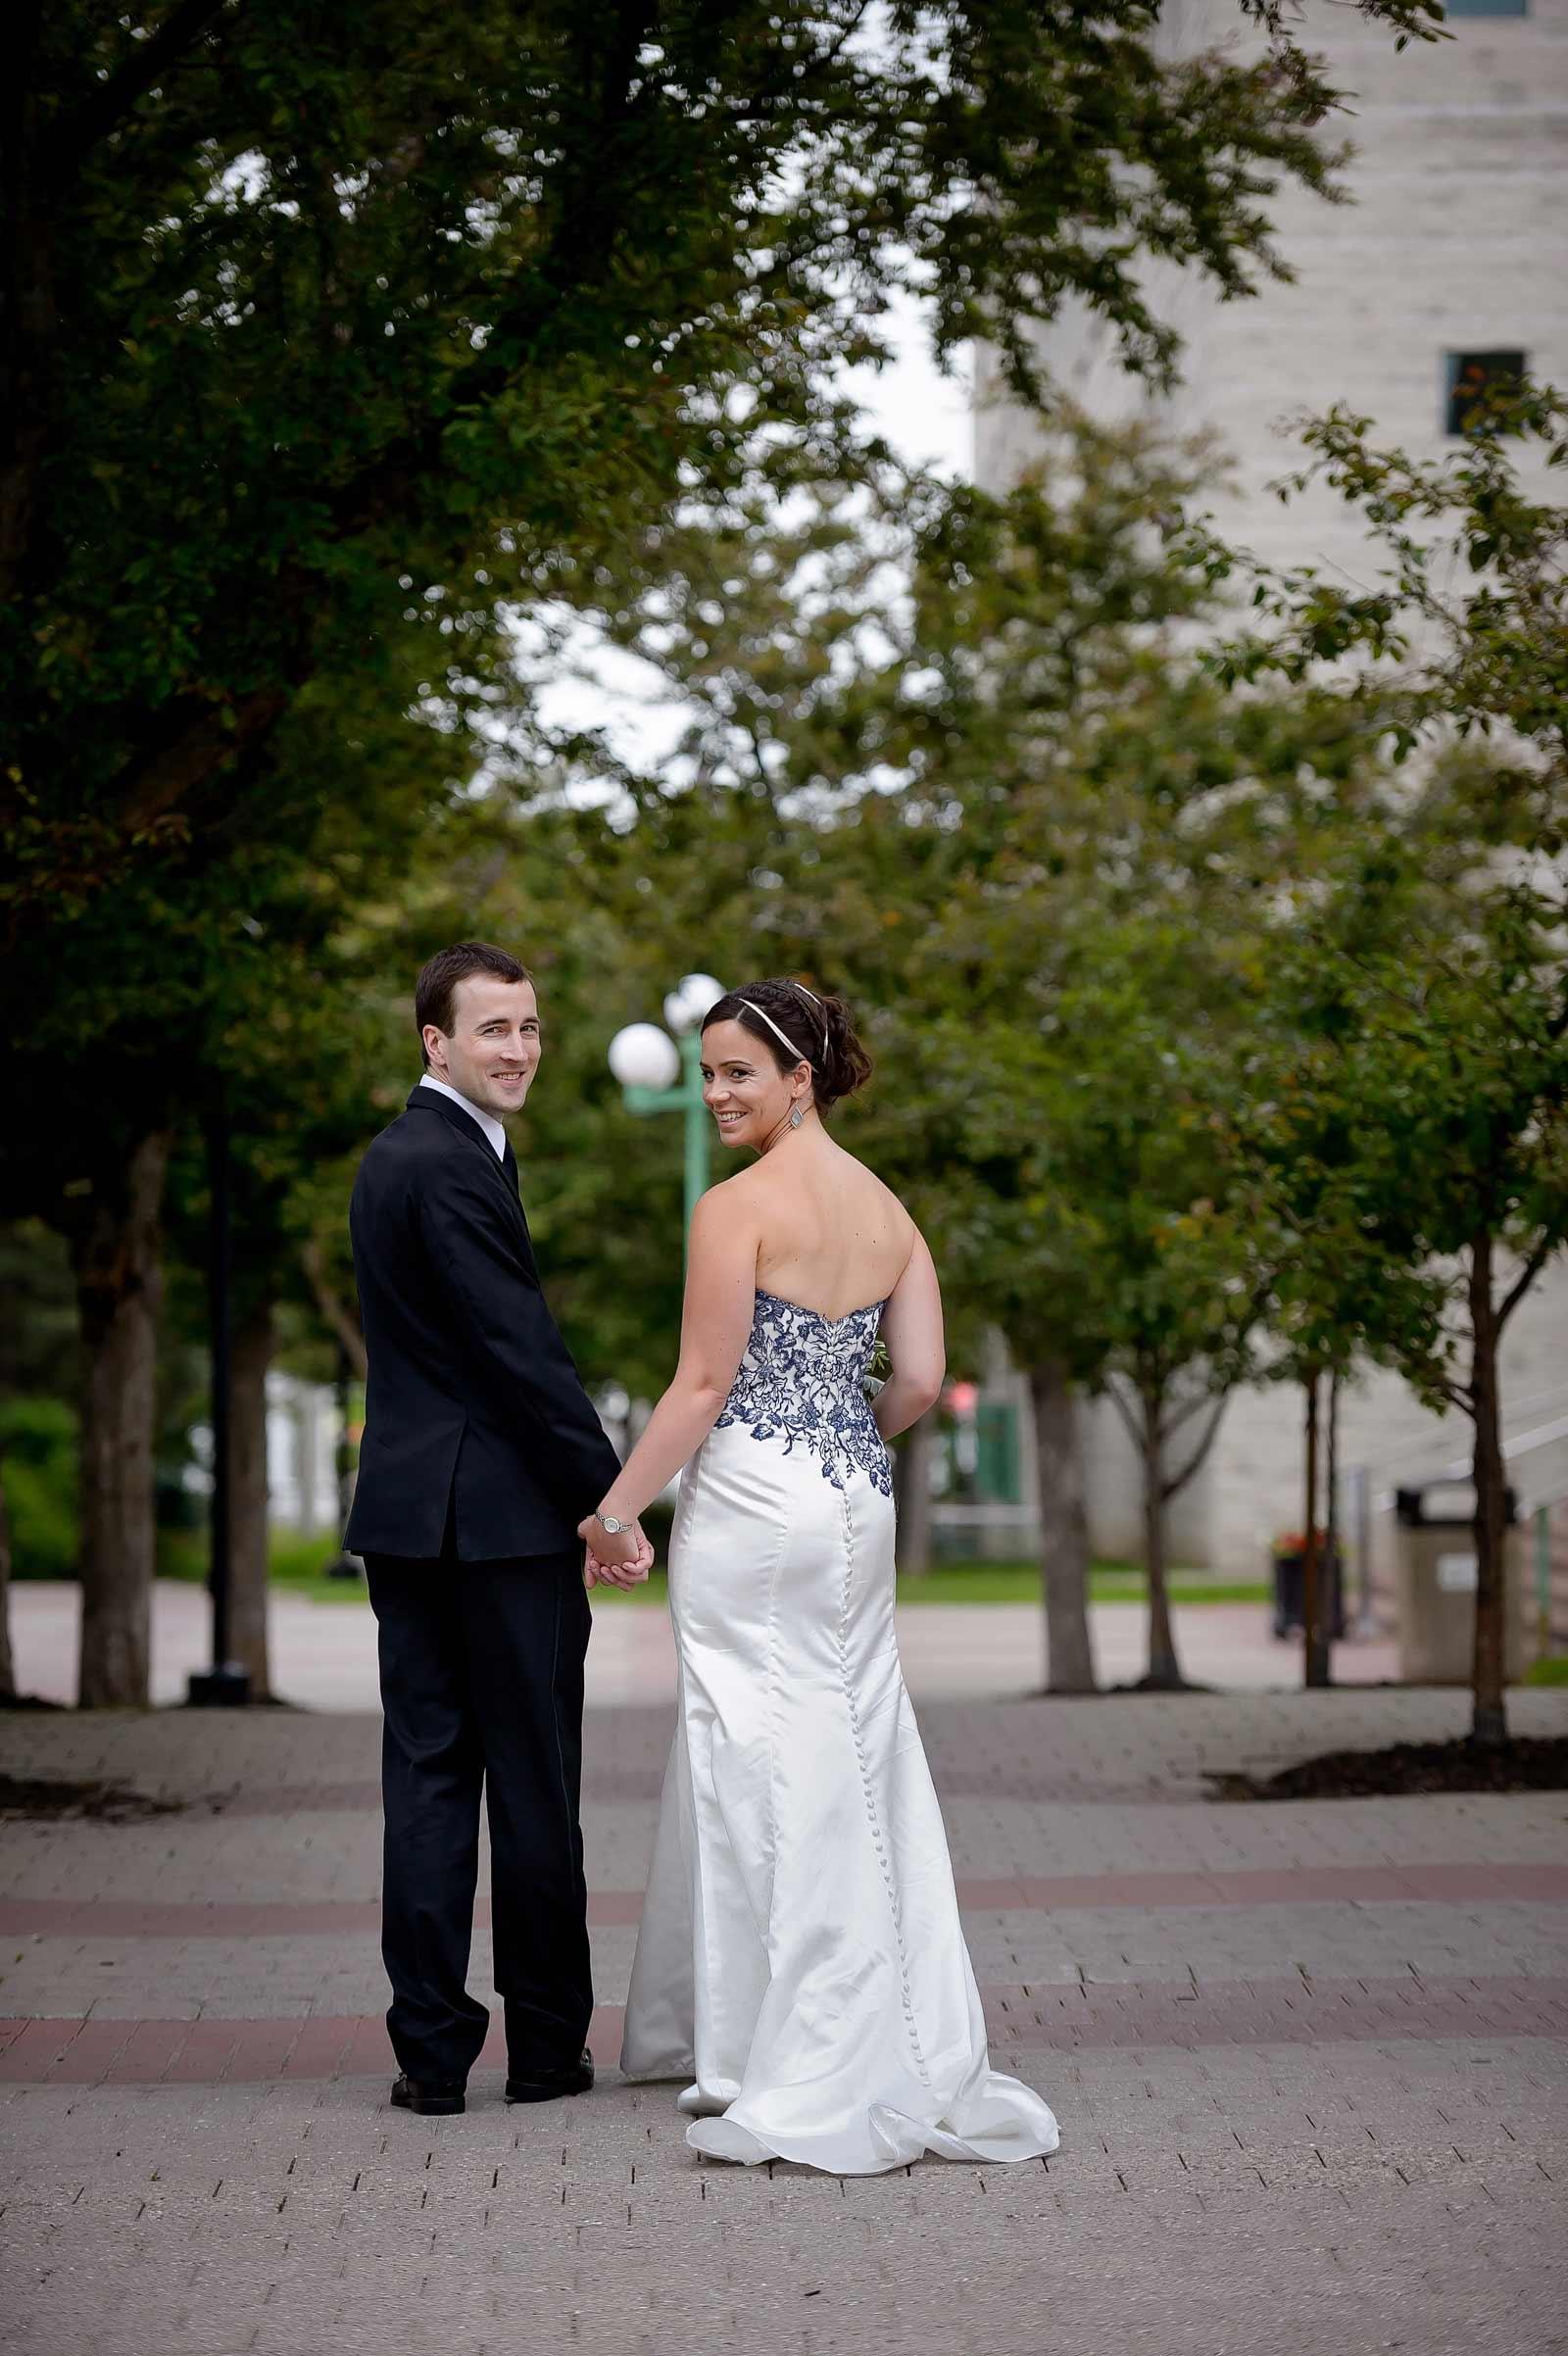 SamanthaBrian-wedding-sneakpeek-06